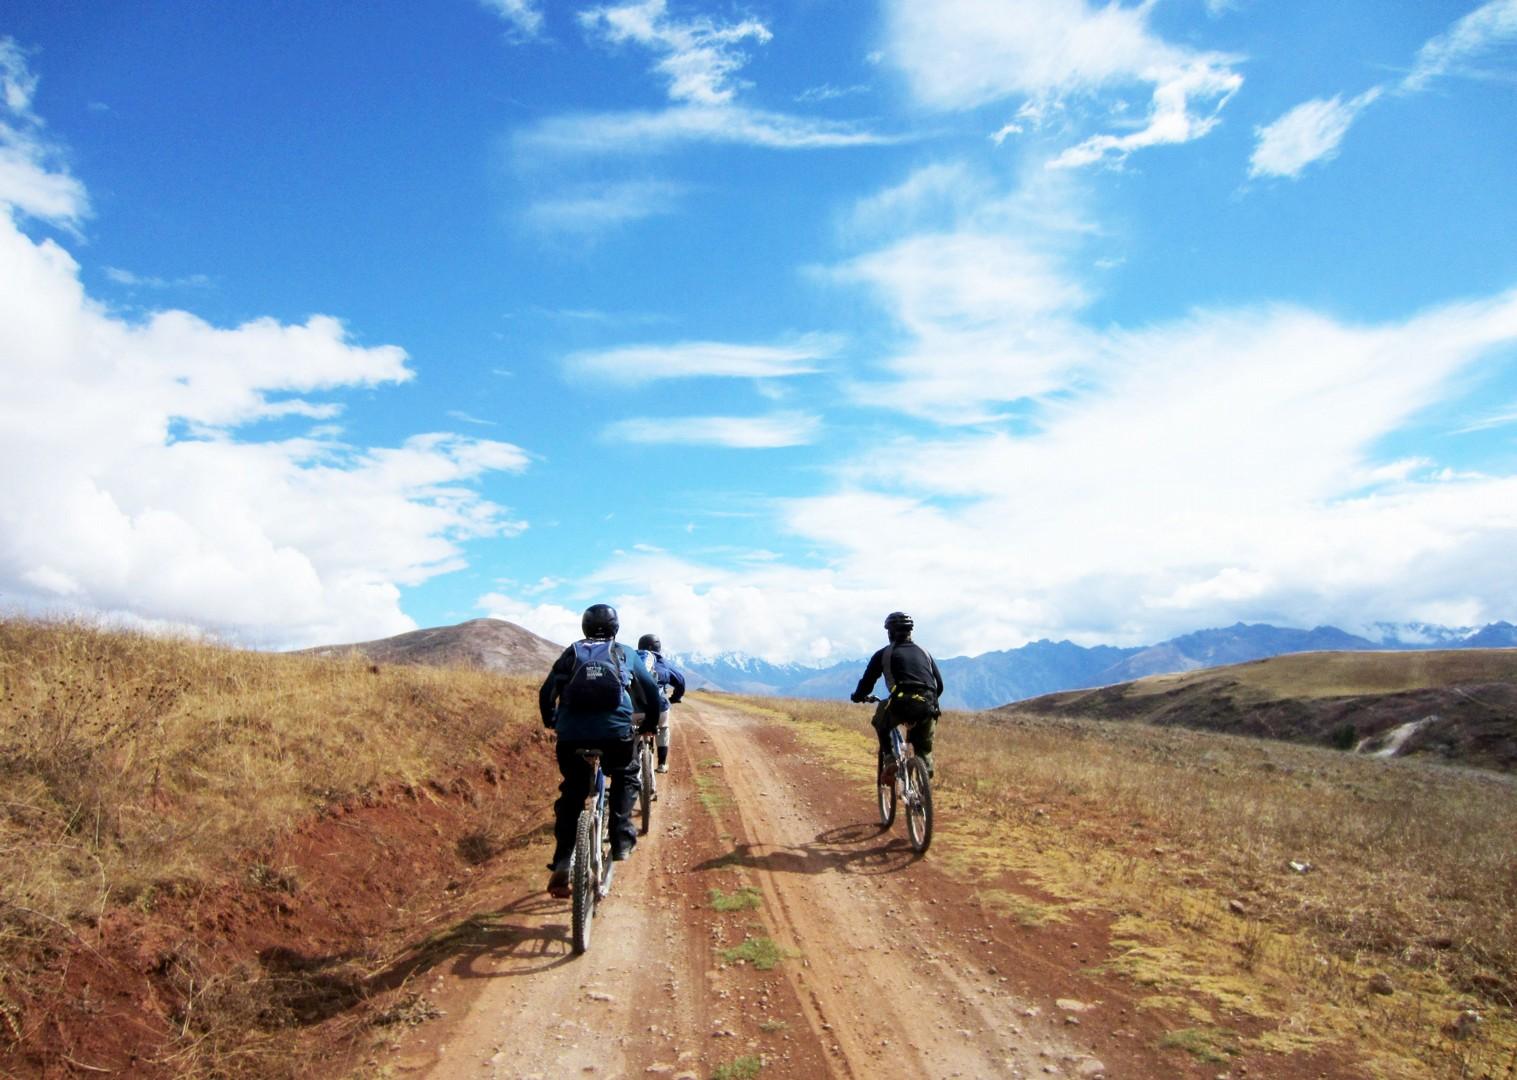 BAS Bike Asalt (2).JPG - Peru - Andean Journey - Guided Mountain Bike Holiday - Mountain Biking